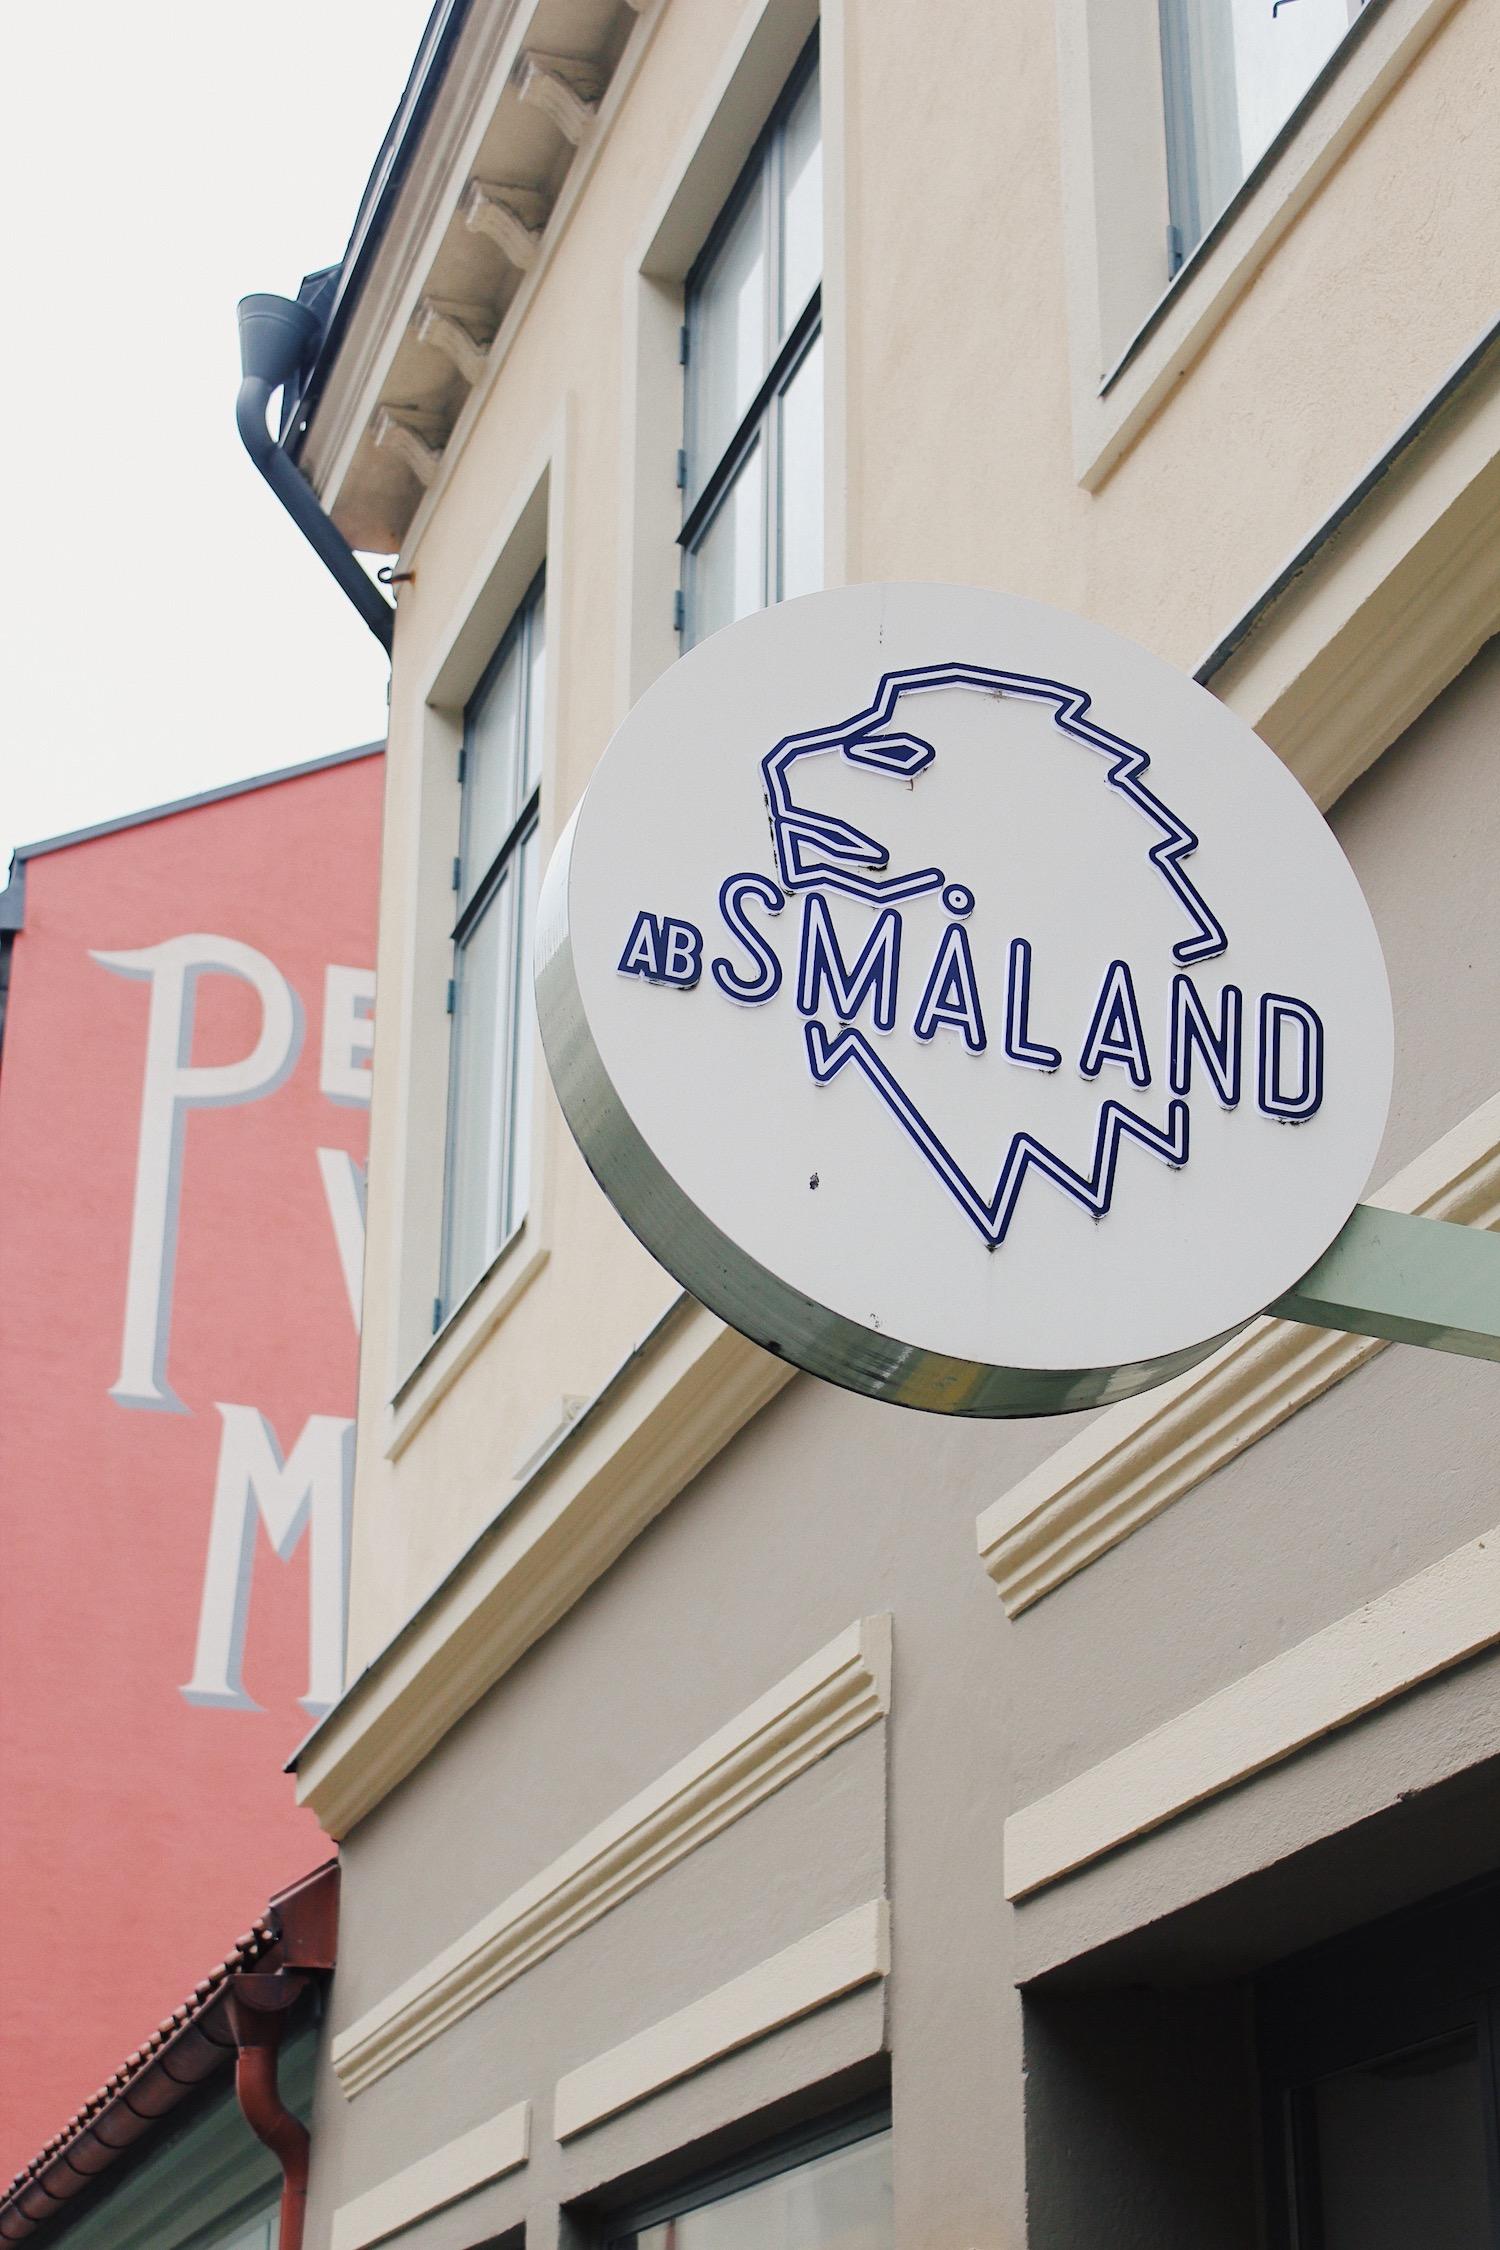 3. INTERIOR | AB SMÅLAND